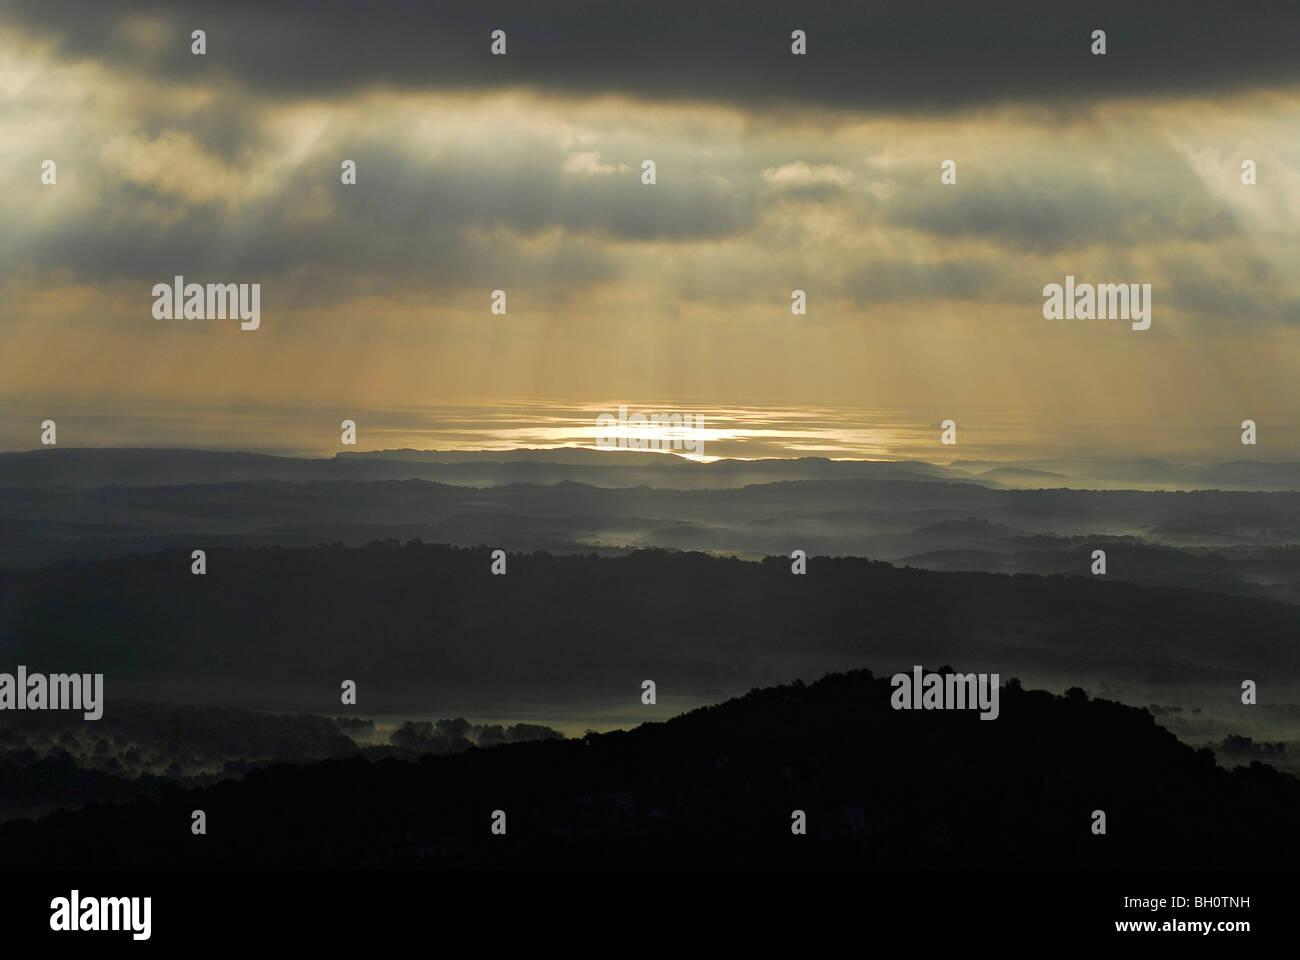 Landscape northeast of Monte Toro at sunrise, Menorca, Balearics, Spain - Stock Image